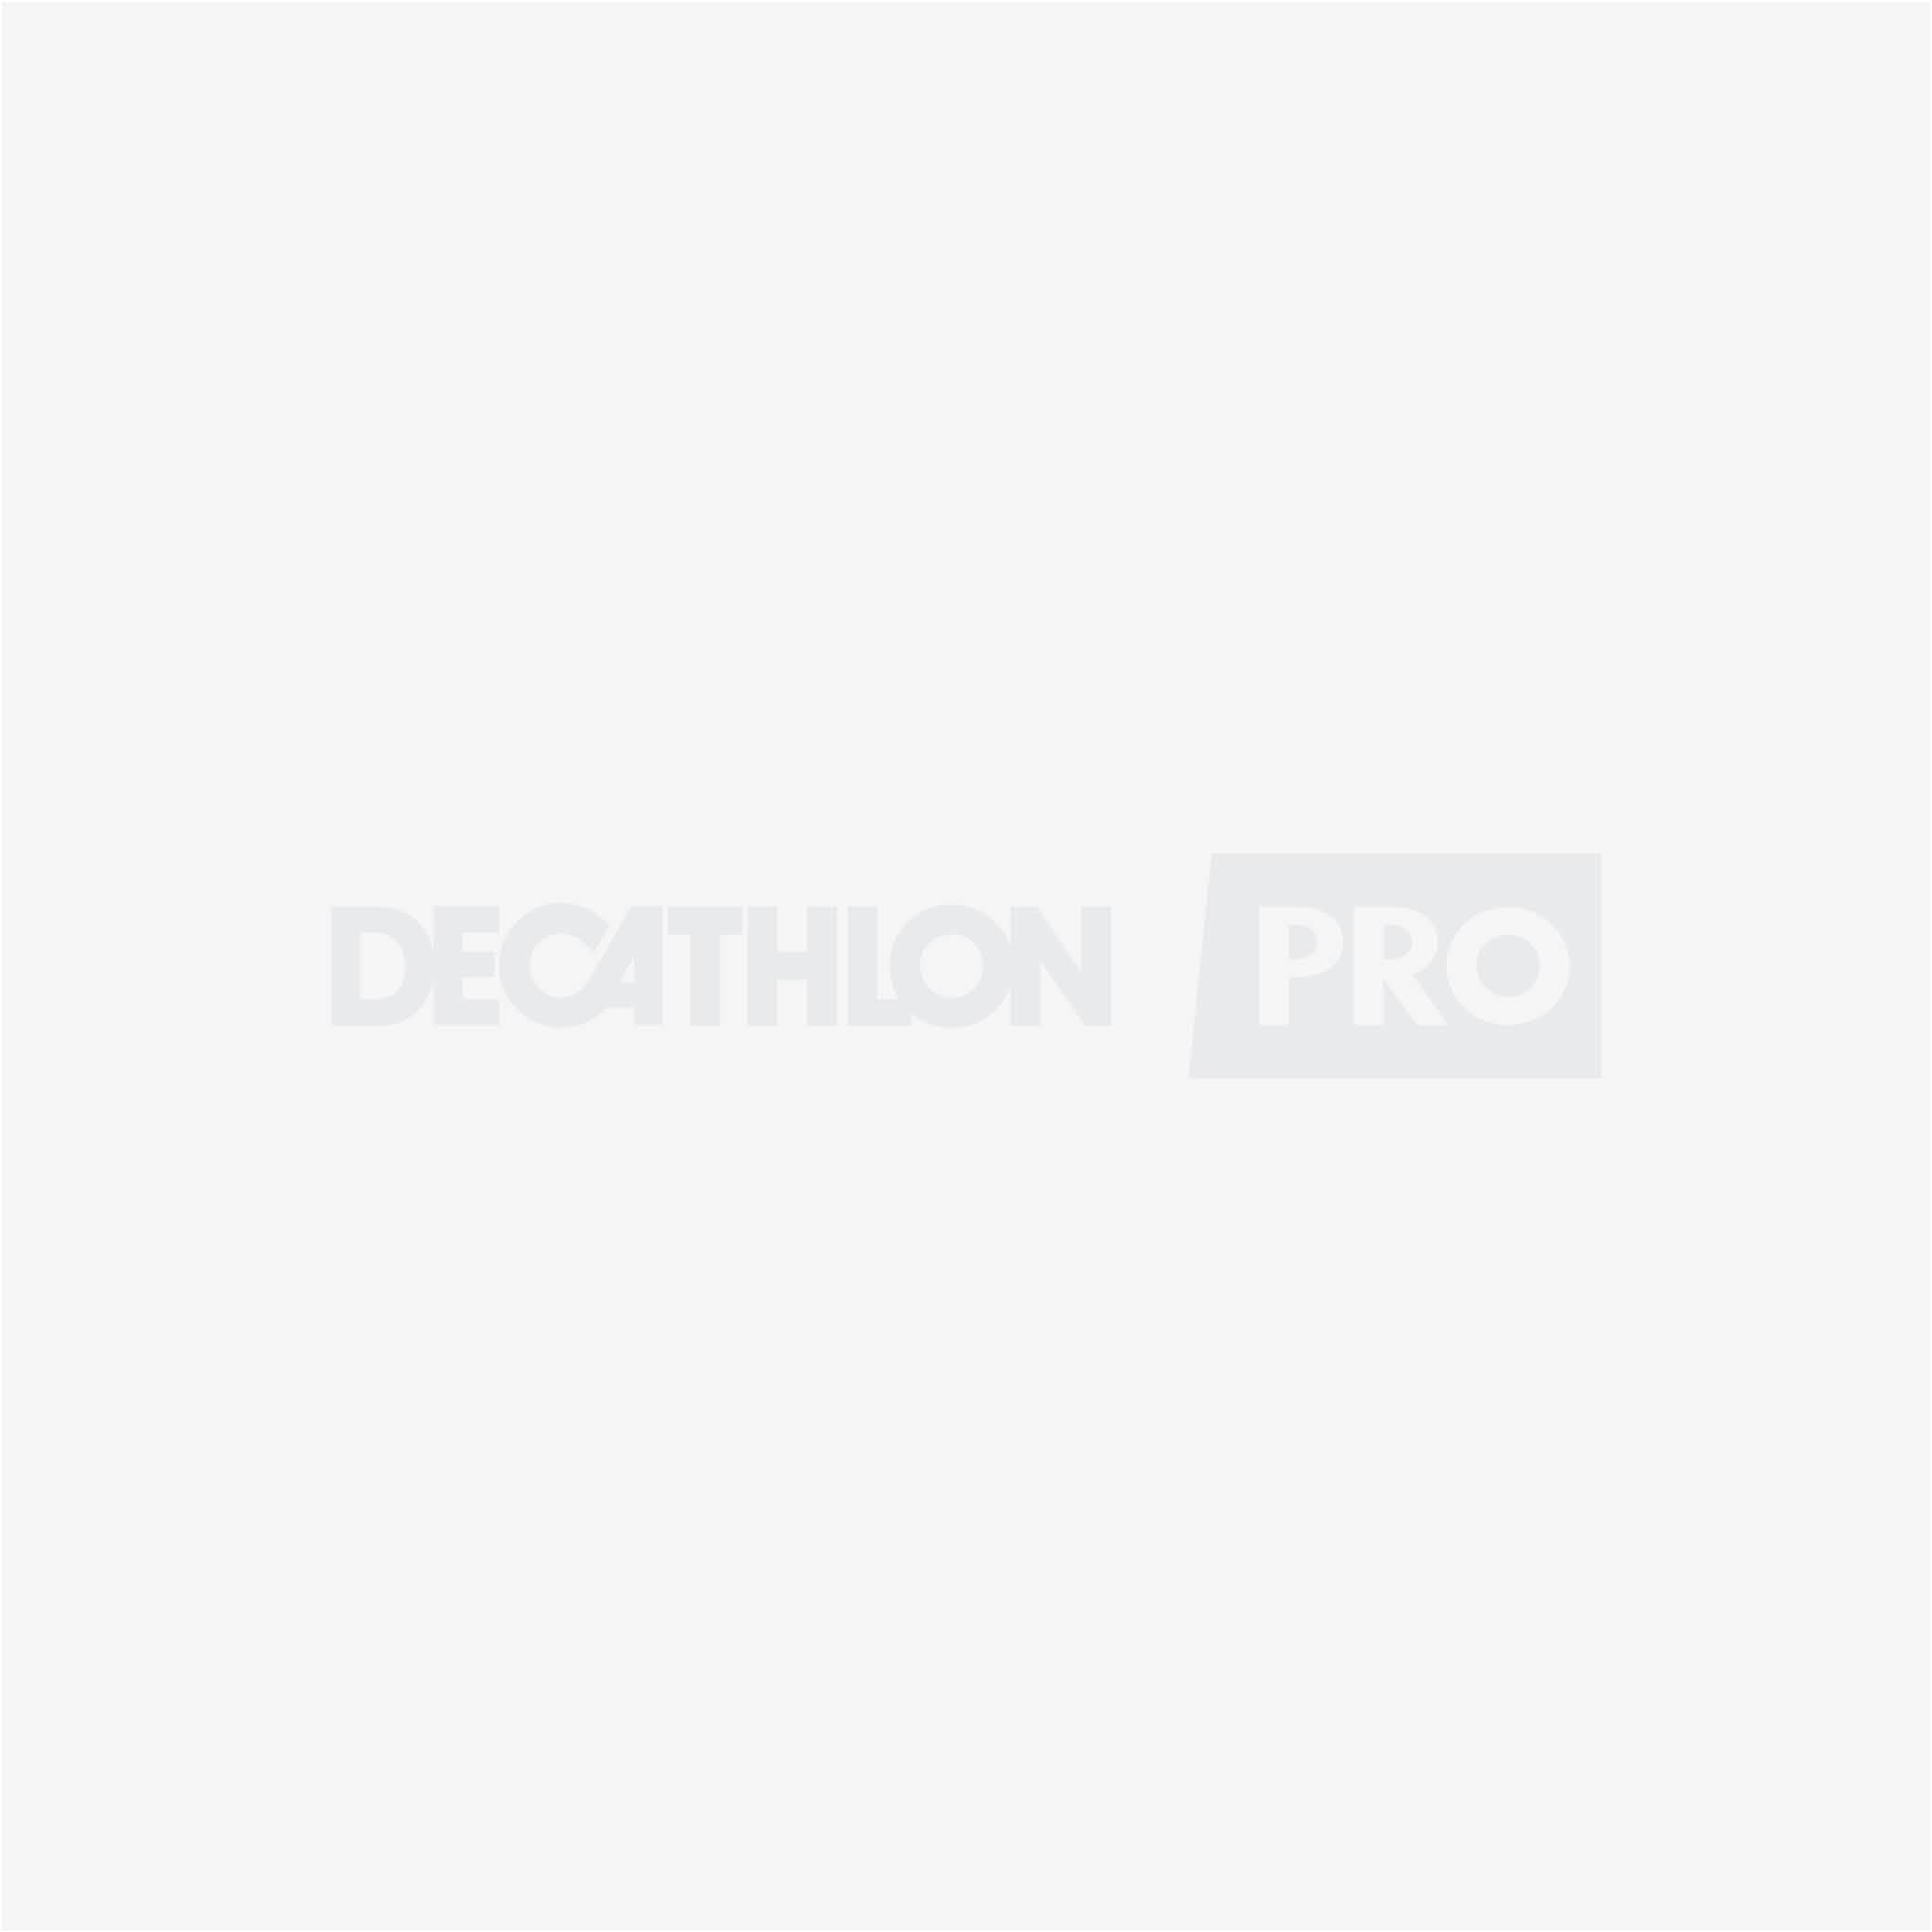 Buts et paniers aquatiques club piscine decathlon pro for Club piscine catalogue